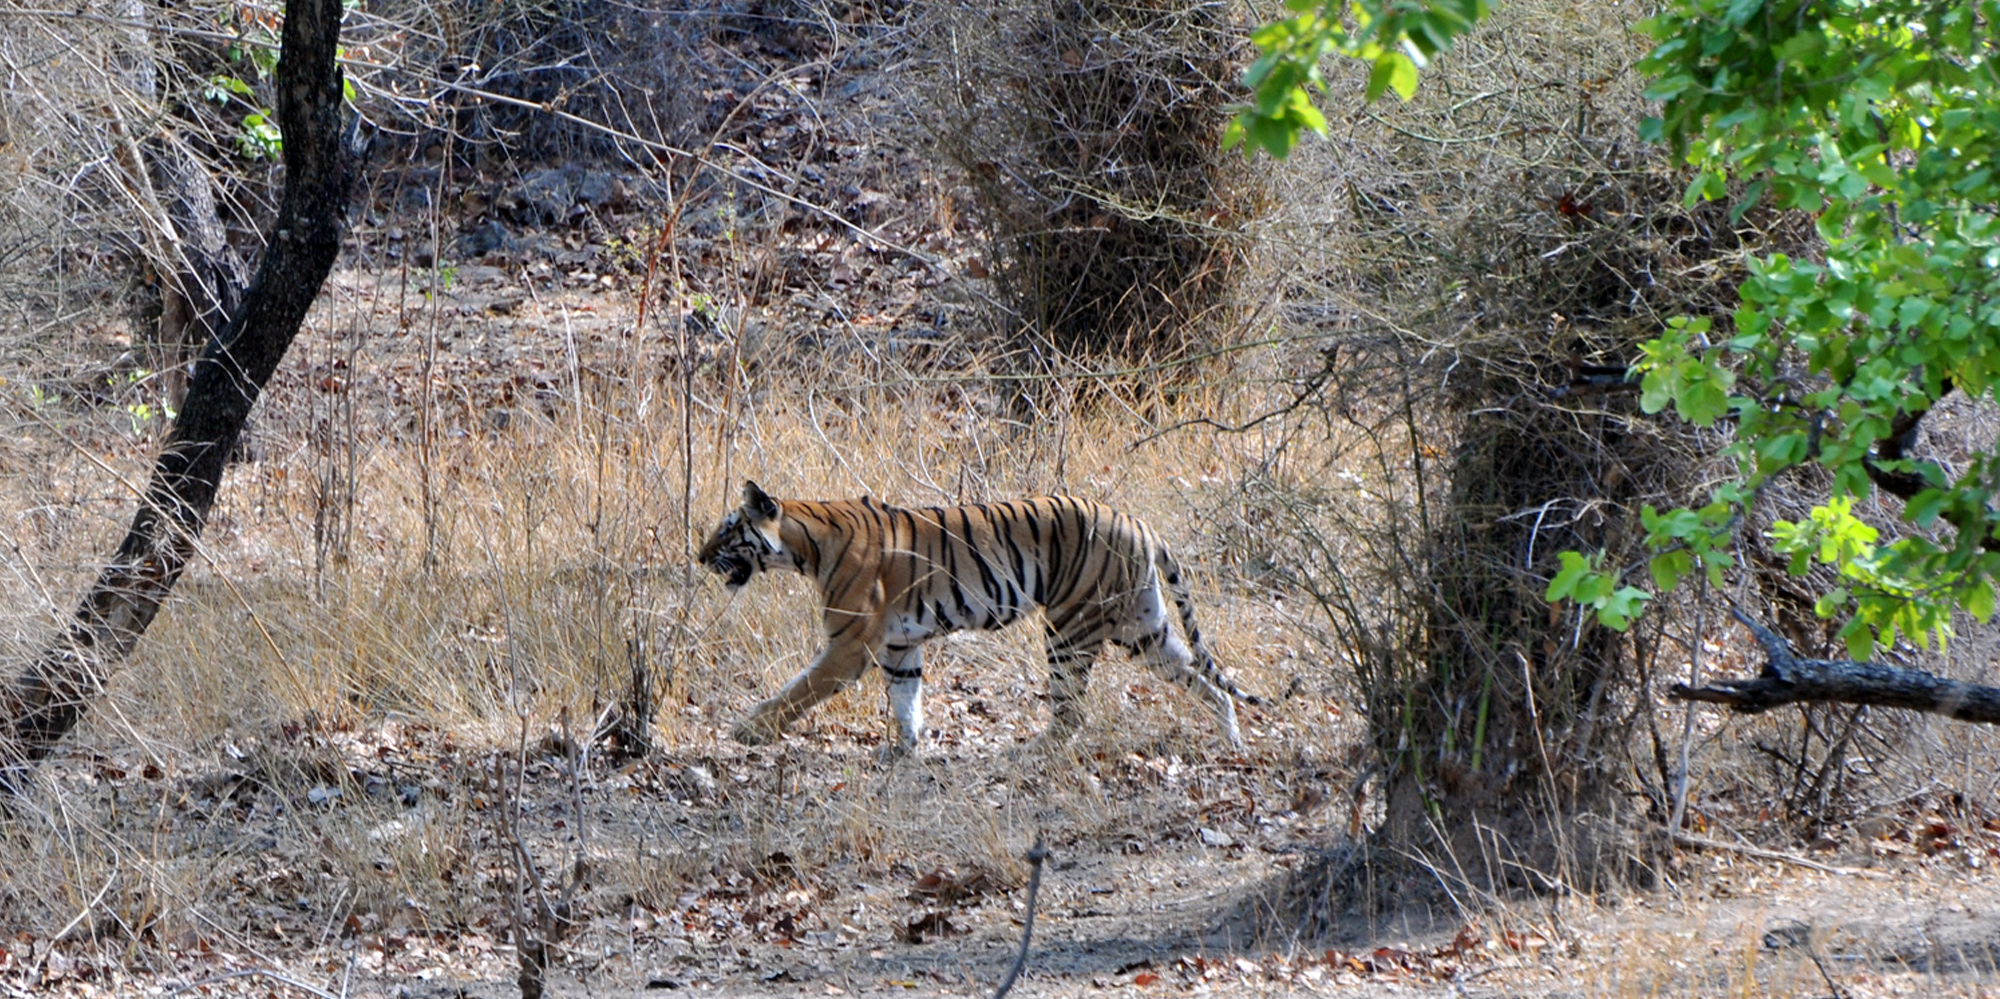 <strong>Bandhavgarh National Park - 1, Bandhavgarh, Madhya Pradesh </strong> -